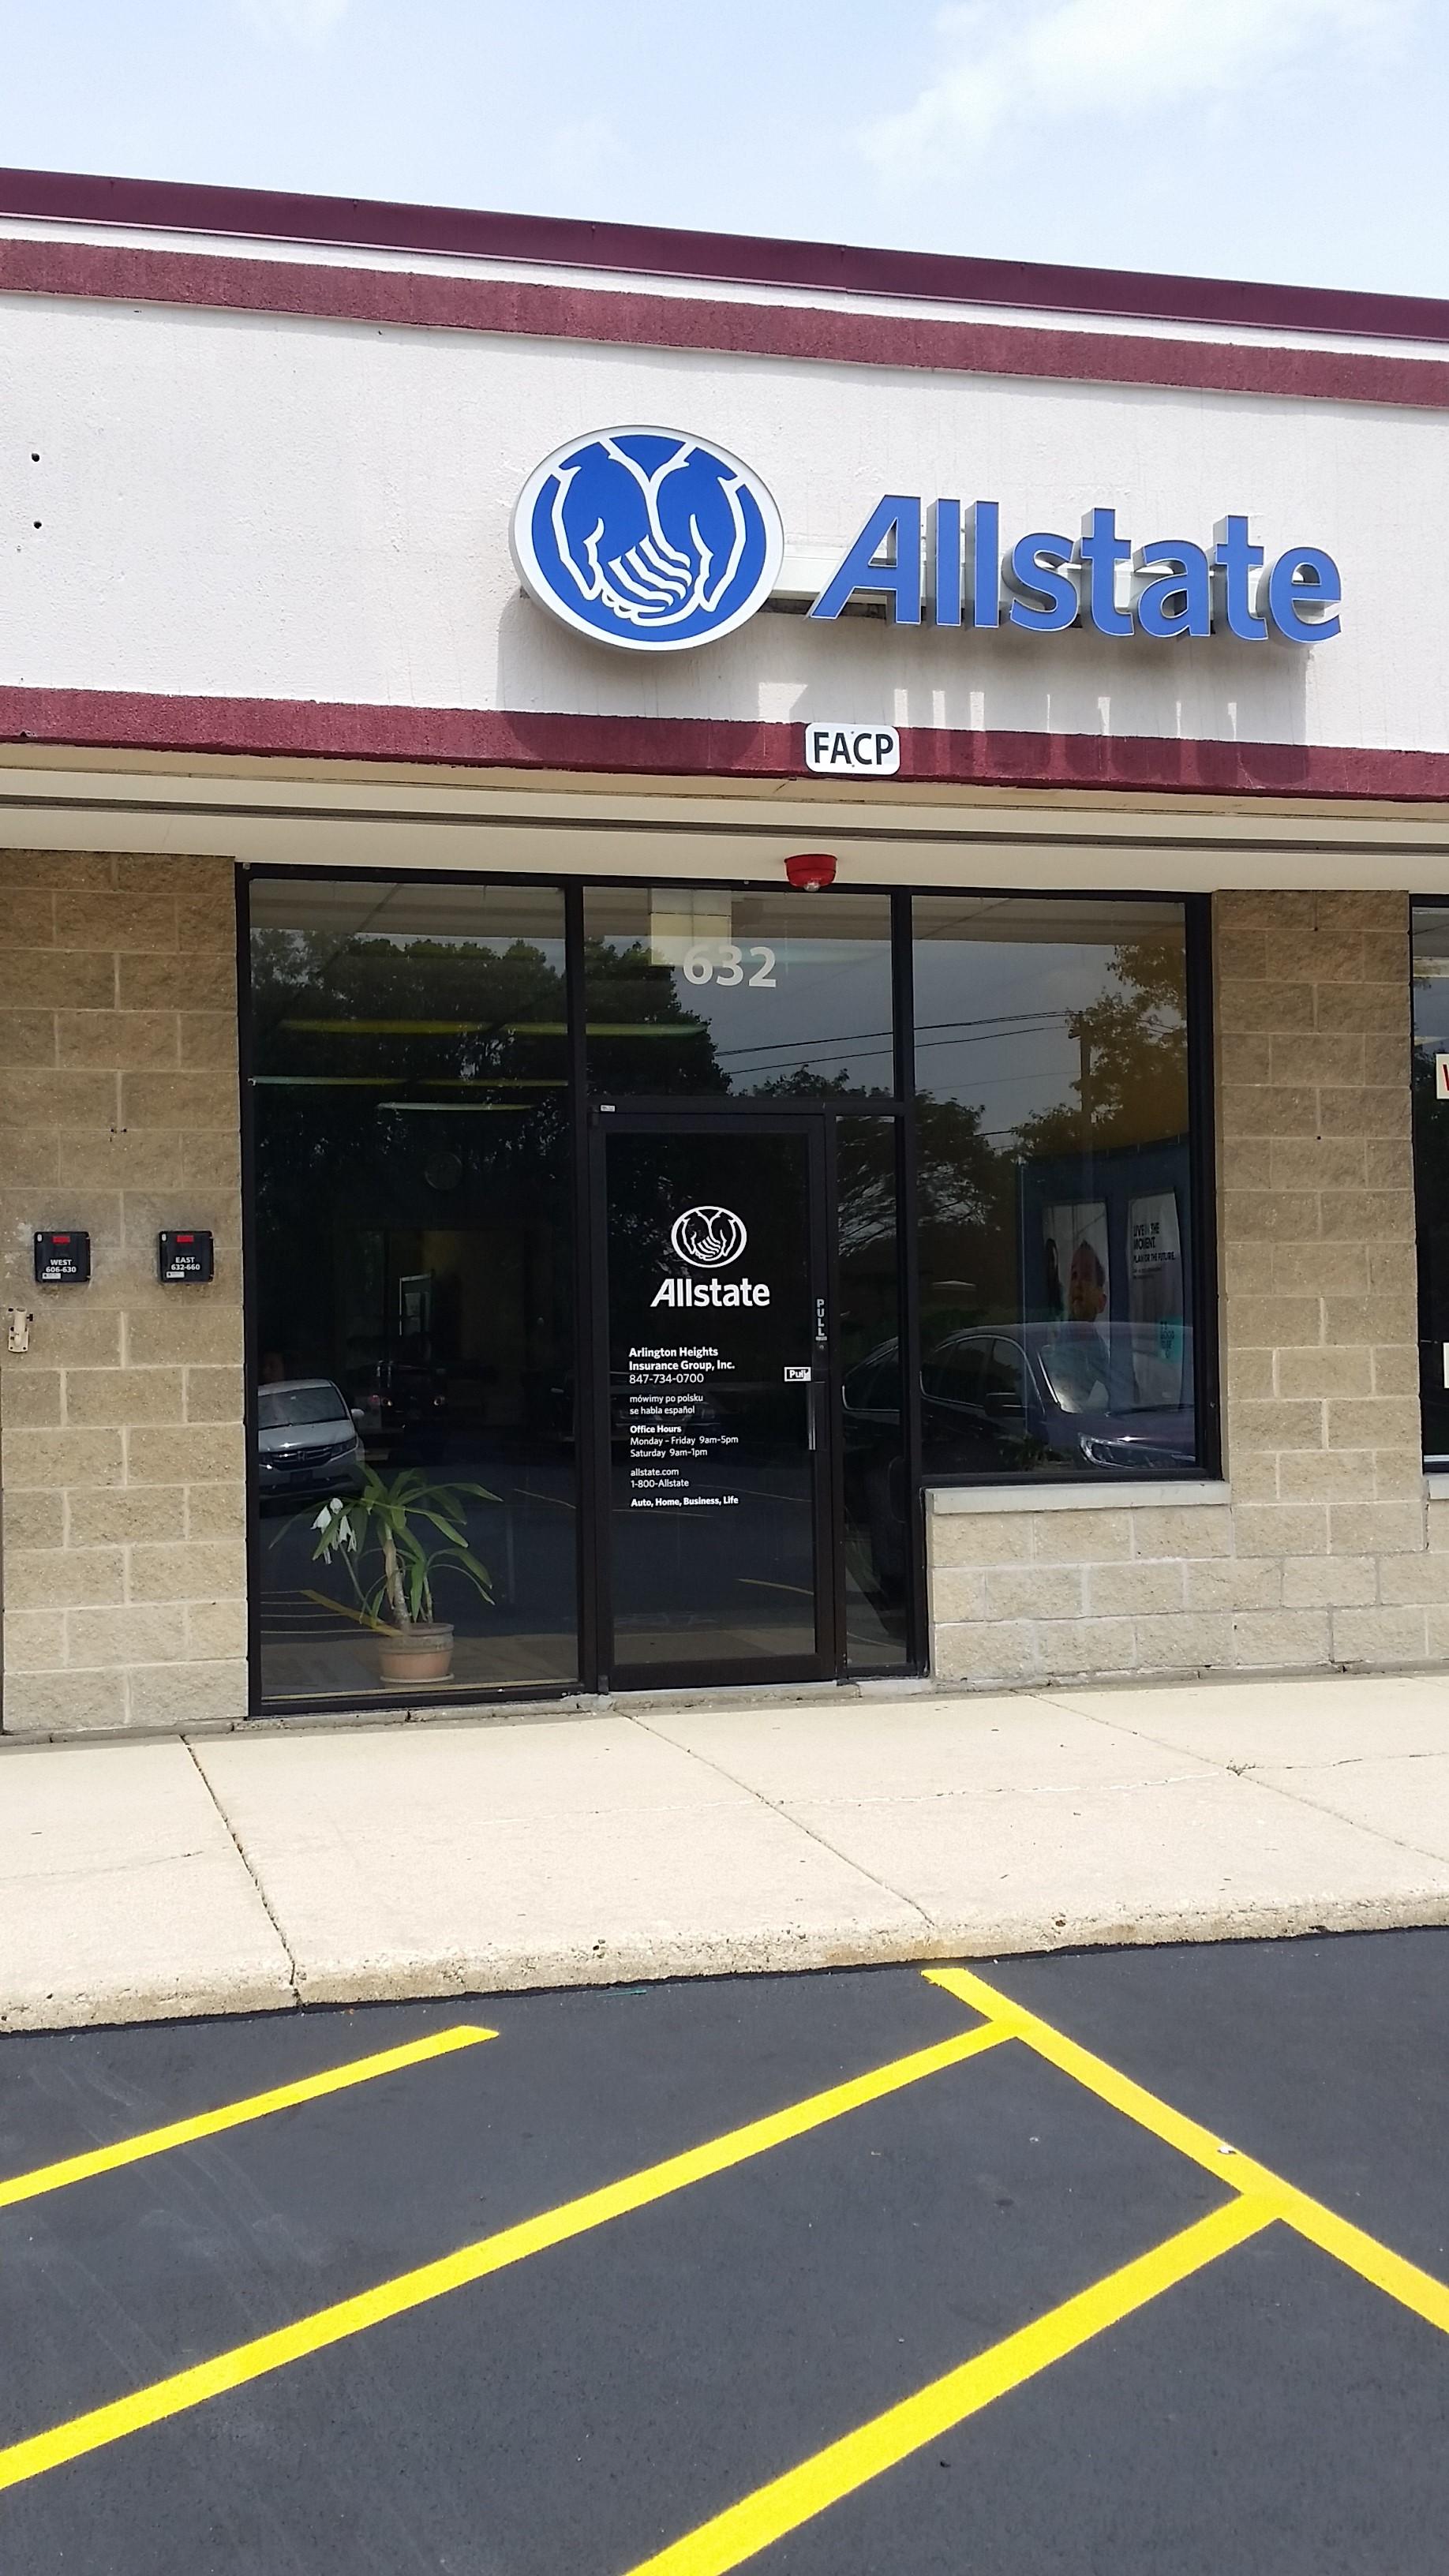 Arlington Heights Insurance Group, Inc.: Allstate Insurance image 6